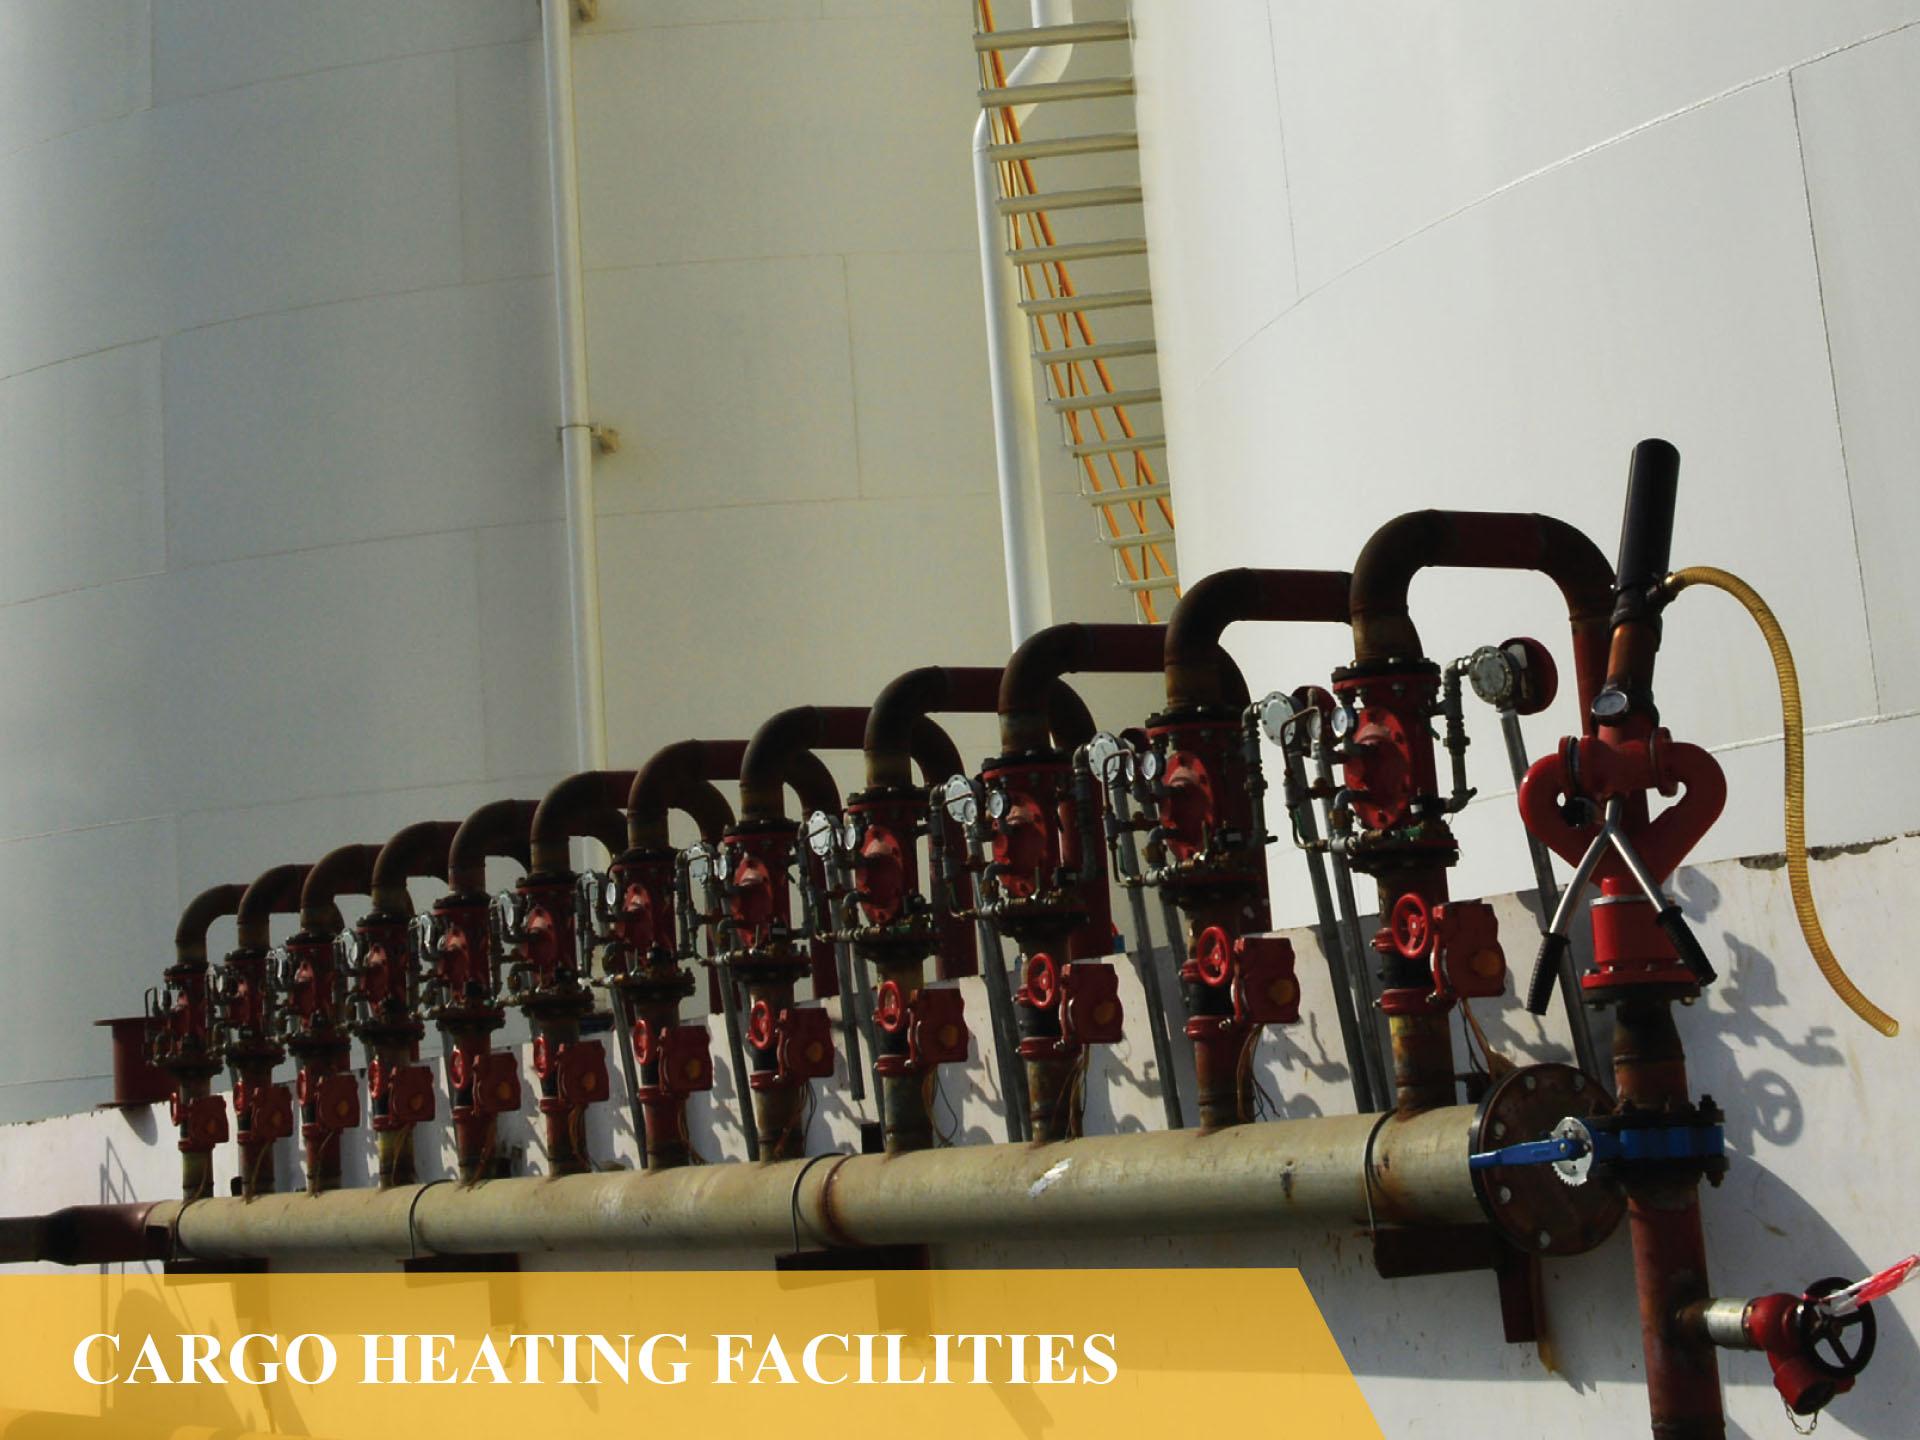 Heating-facilities